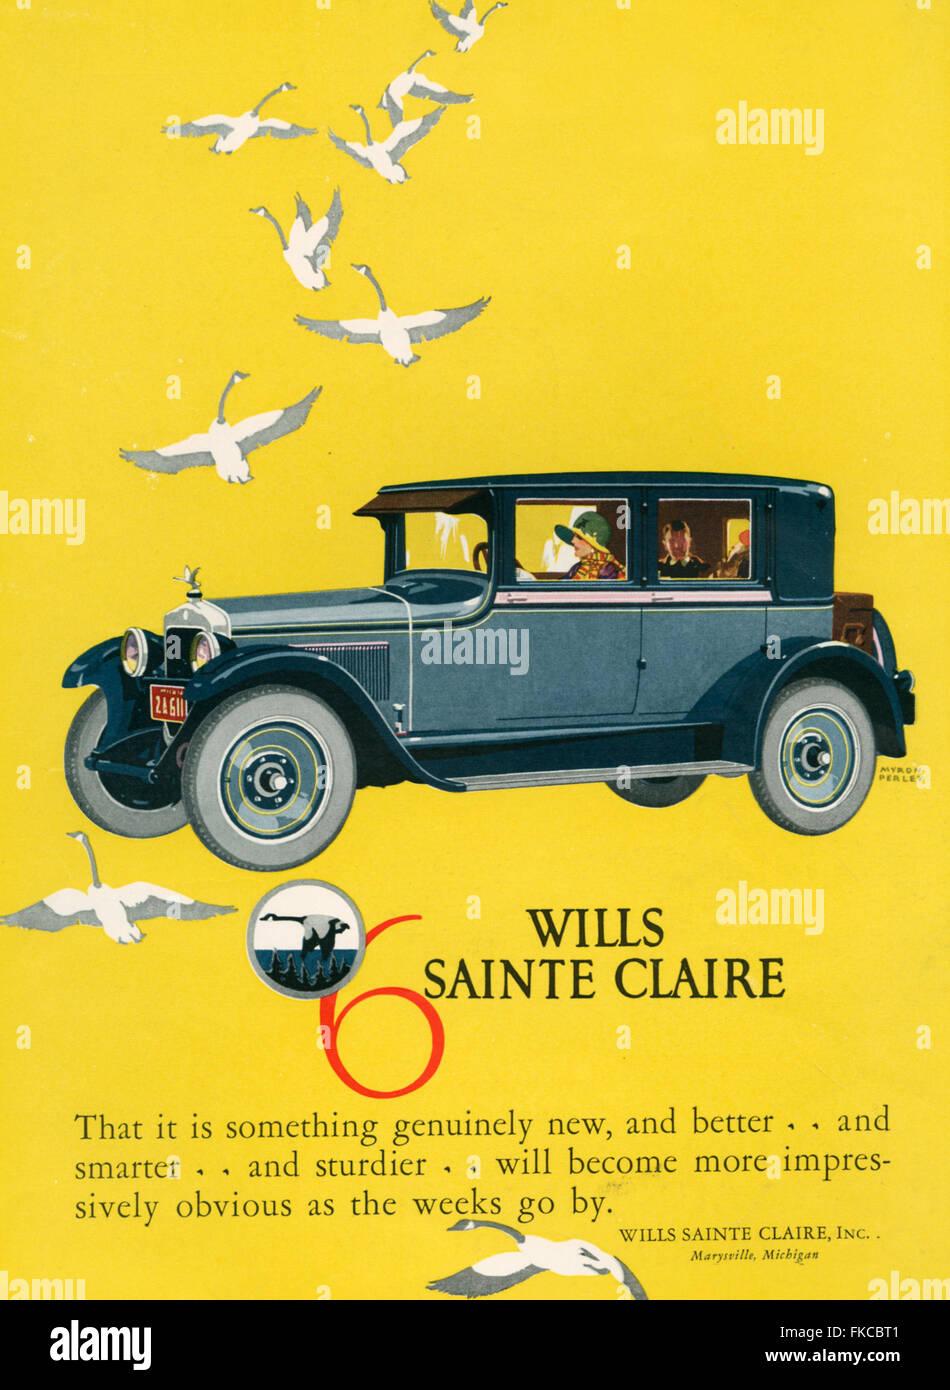 1920s USA Wills-Sainte Claire Magazine Advert - Stock Image